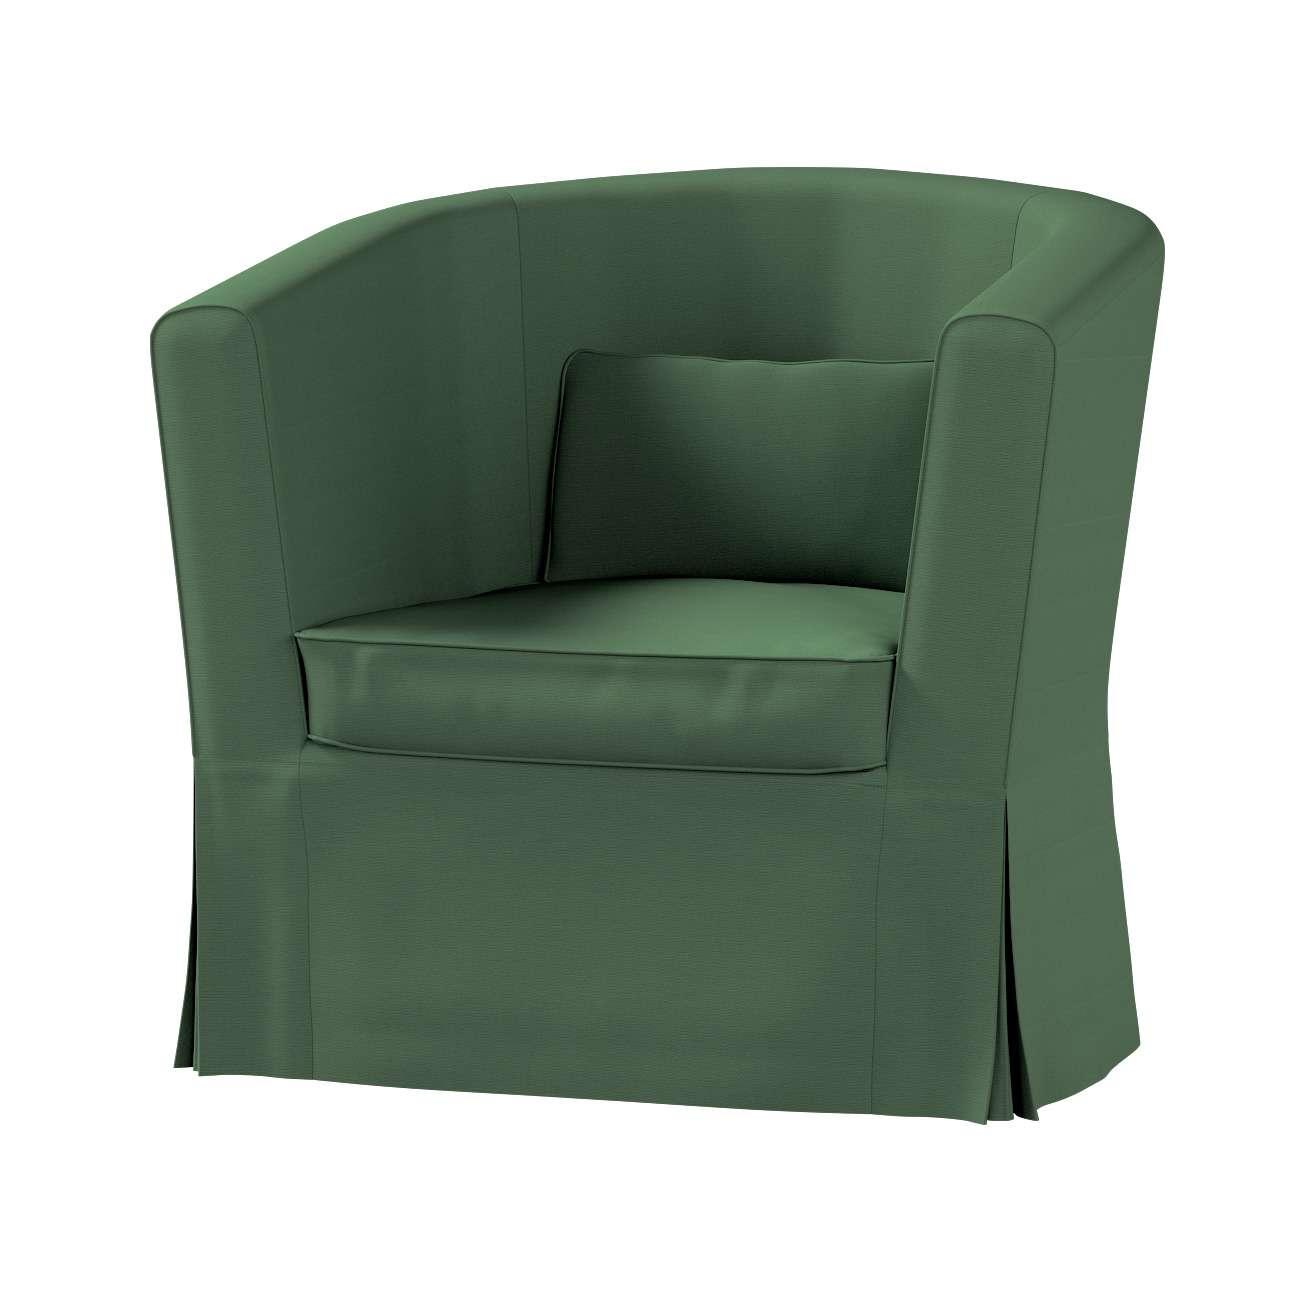 Ektorp Tullsta Sesselbezug Sesselhusse, Ektorp Tullsta von der Kollektion Cotton Panama, Stoff: 702-06